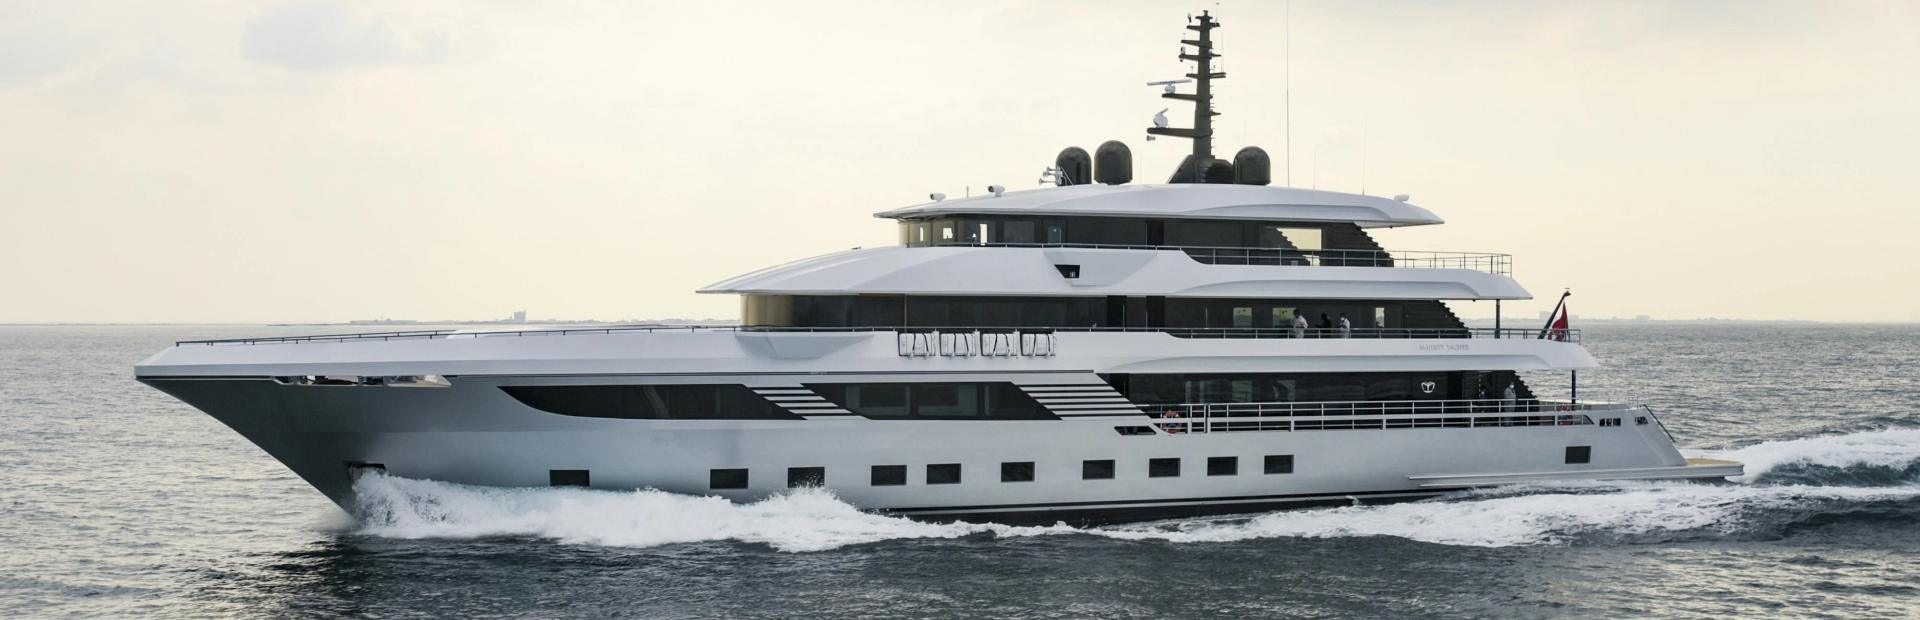 Majesty 175 Yacht Charter